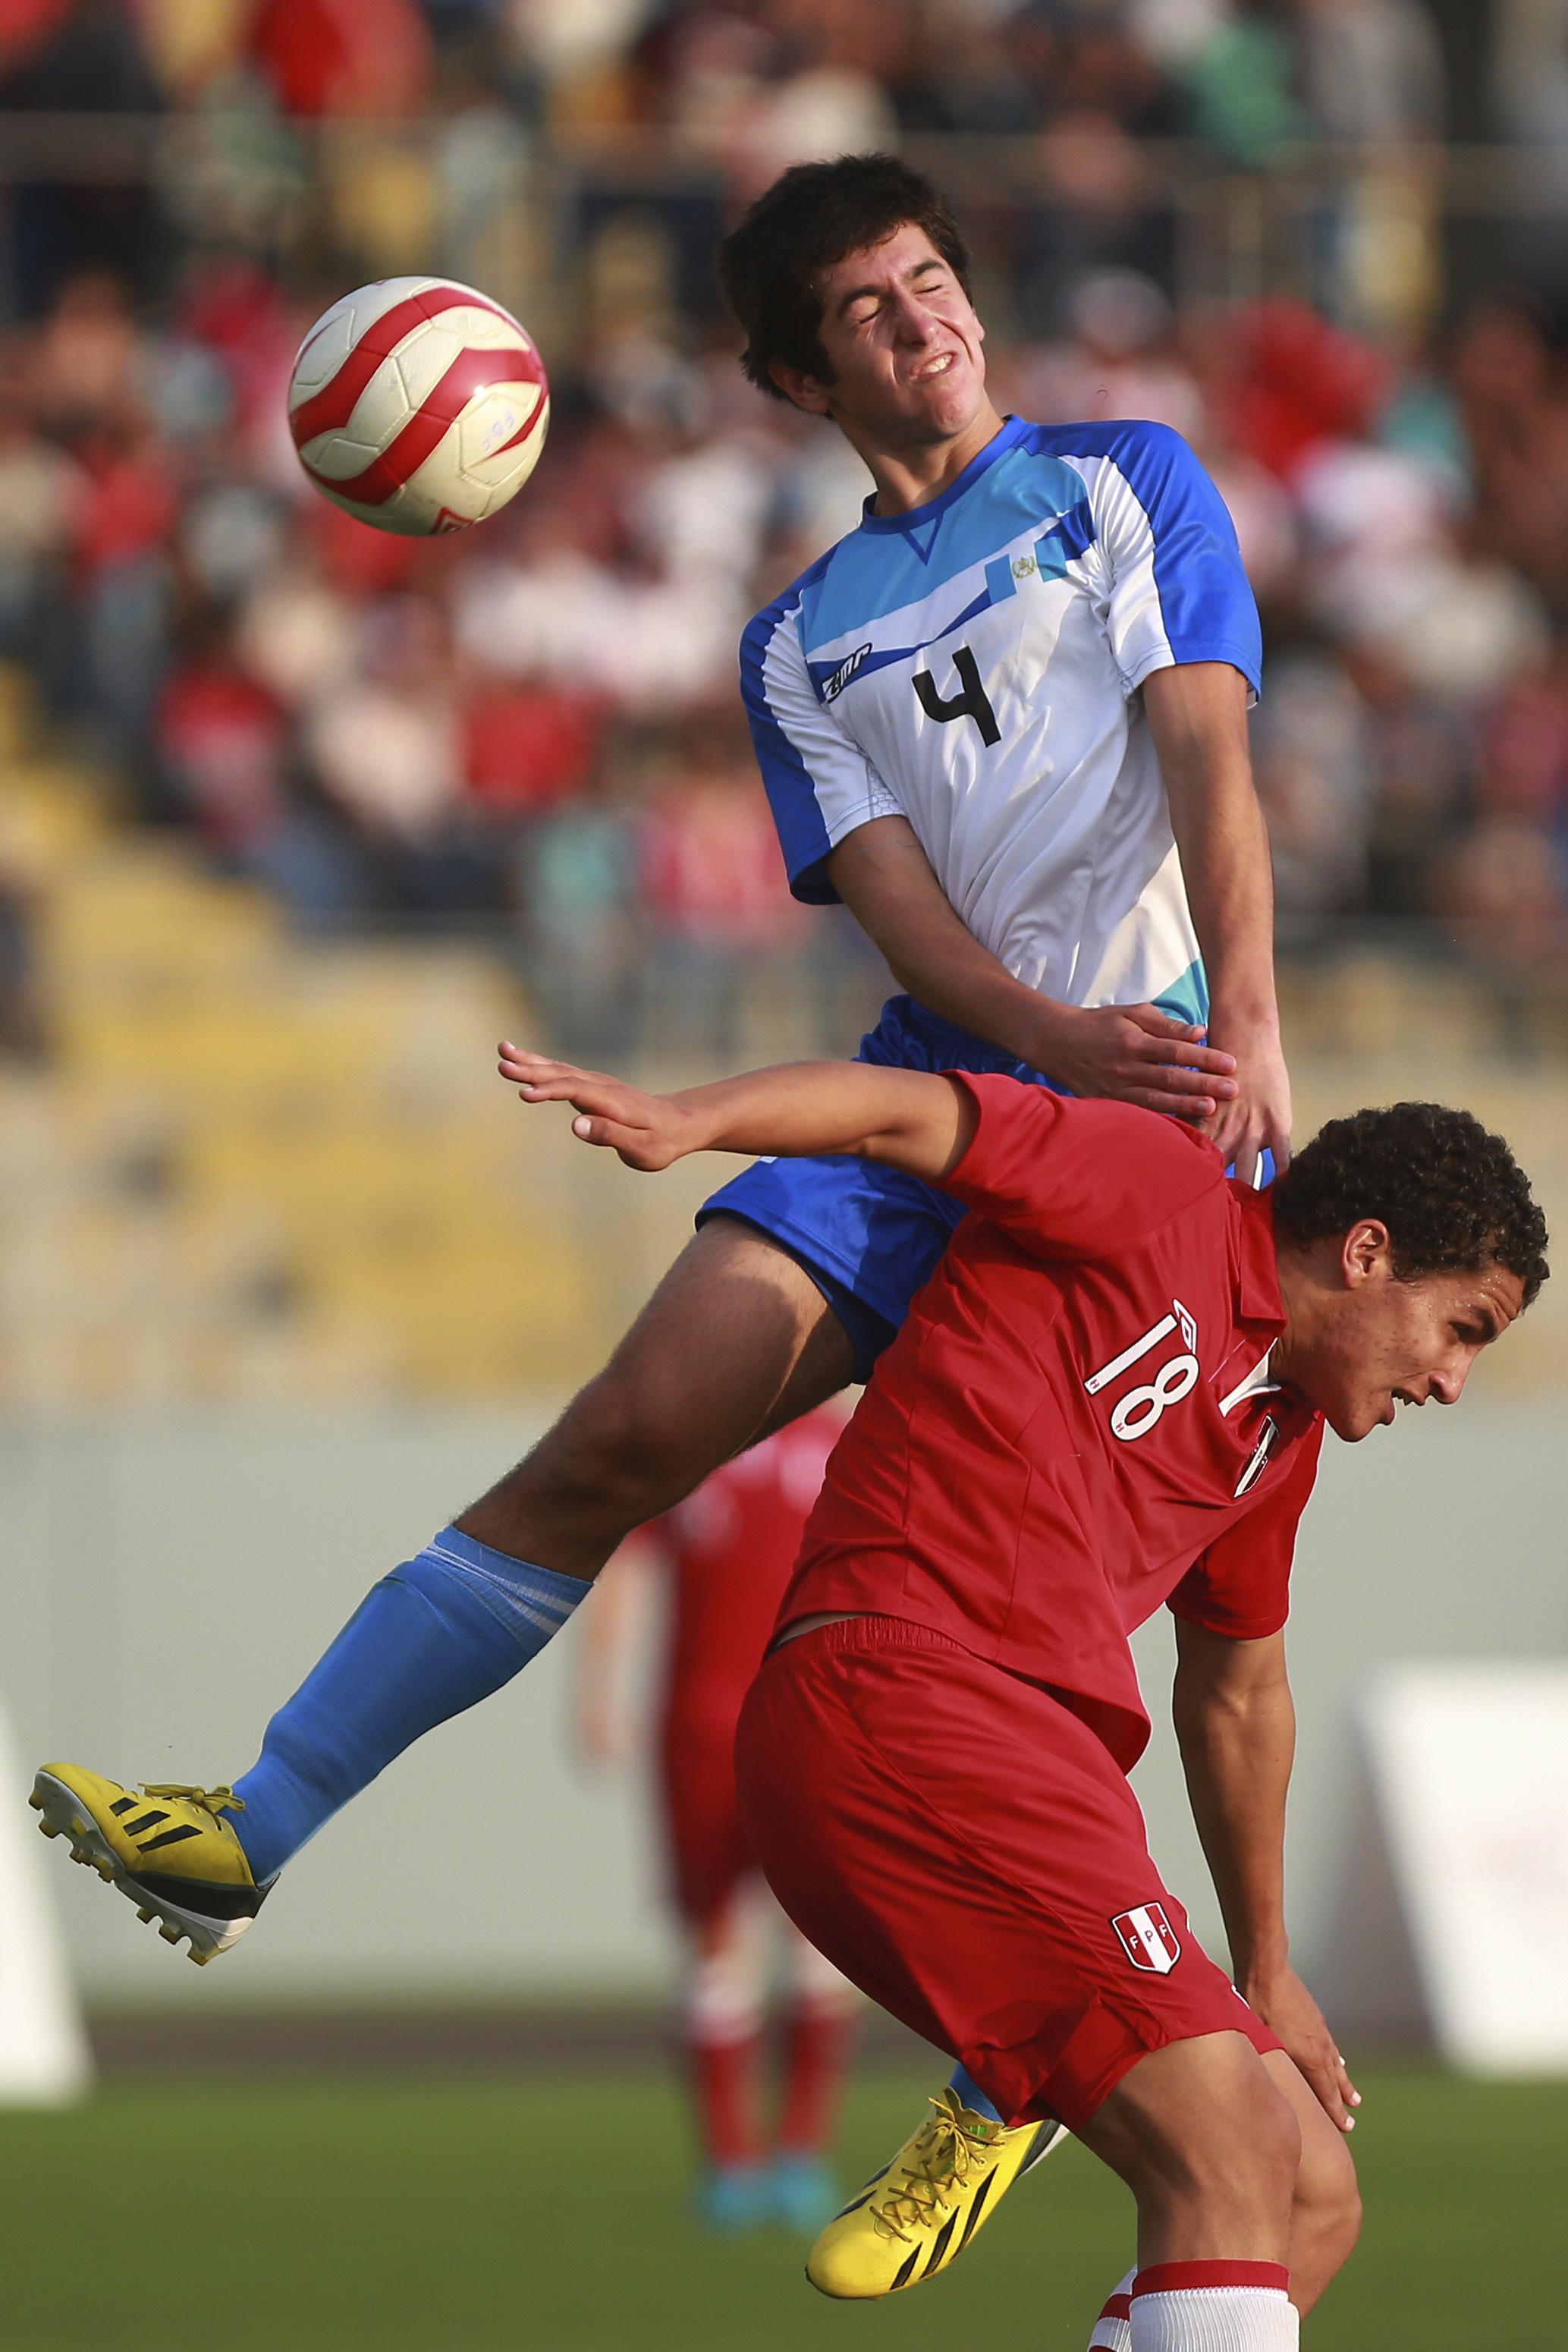 XVII Bolivarian Games Trujillo 2013 - Football